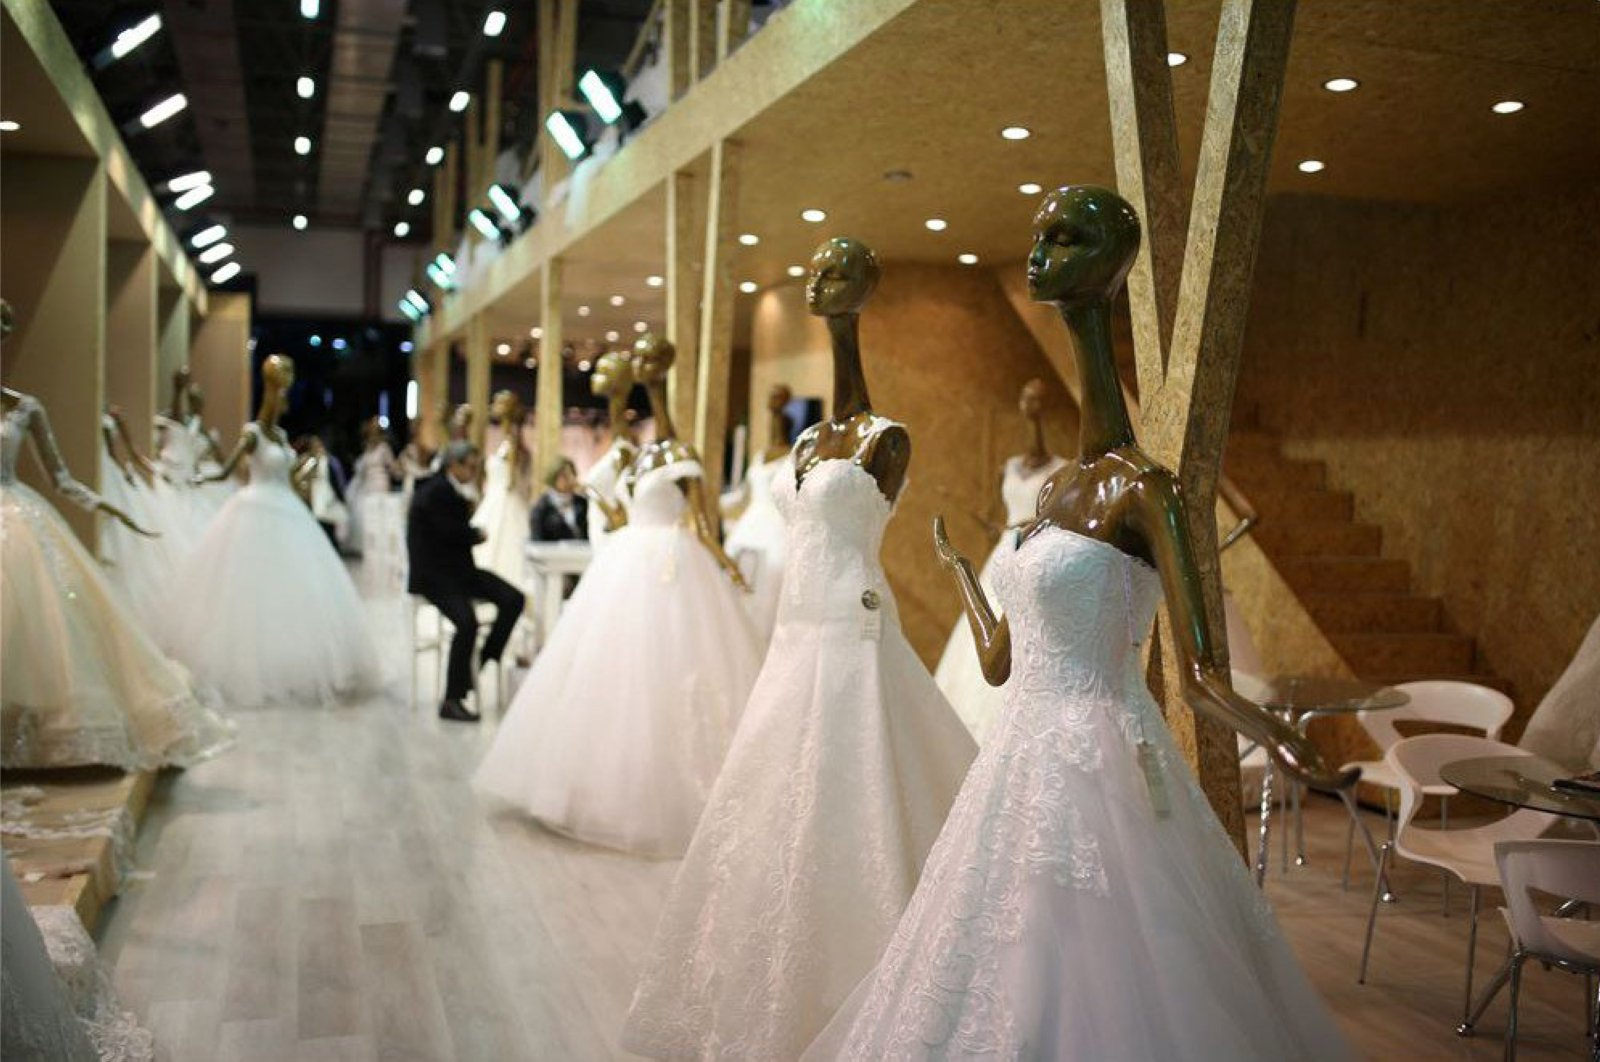 Wedding dresses are displayed at the IF Wedding Fashion Expo in İzmir, Turkey, on Jan. 26, 2019. (IHA Photo)